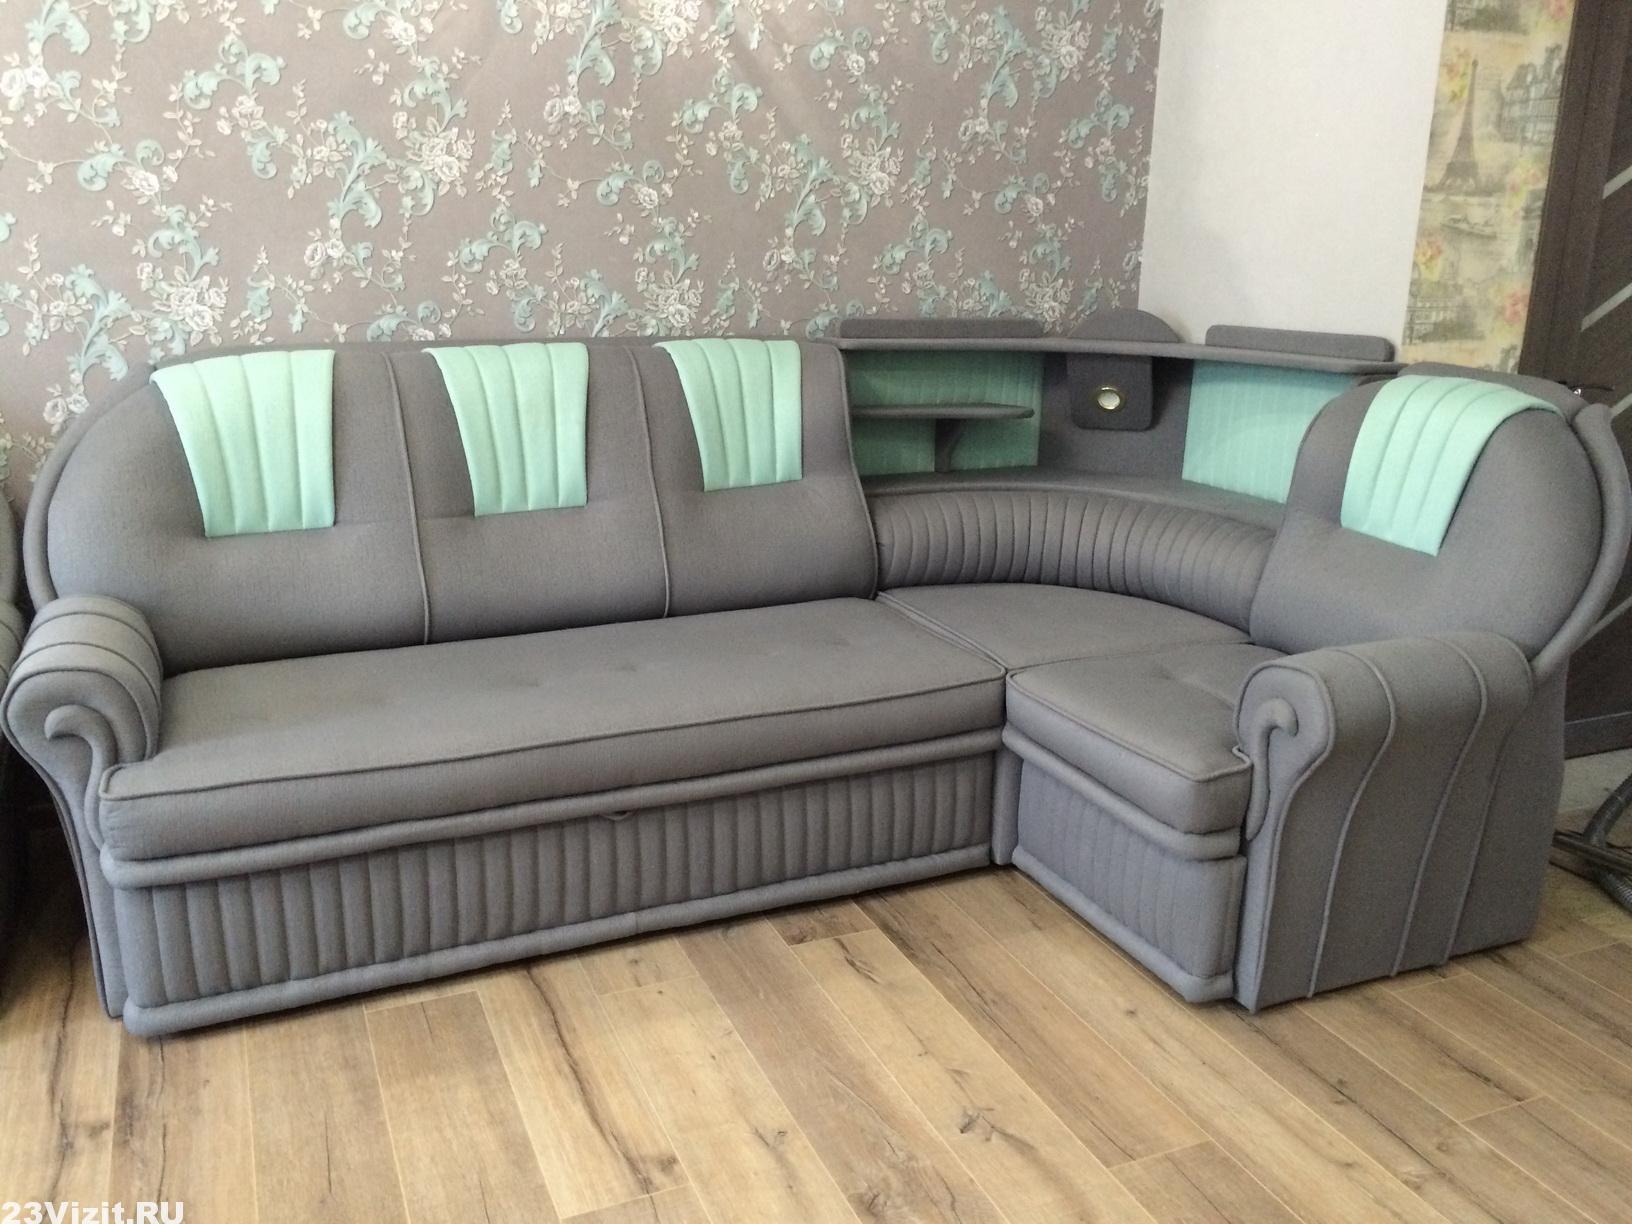 Реставрация дивана Краснодар